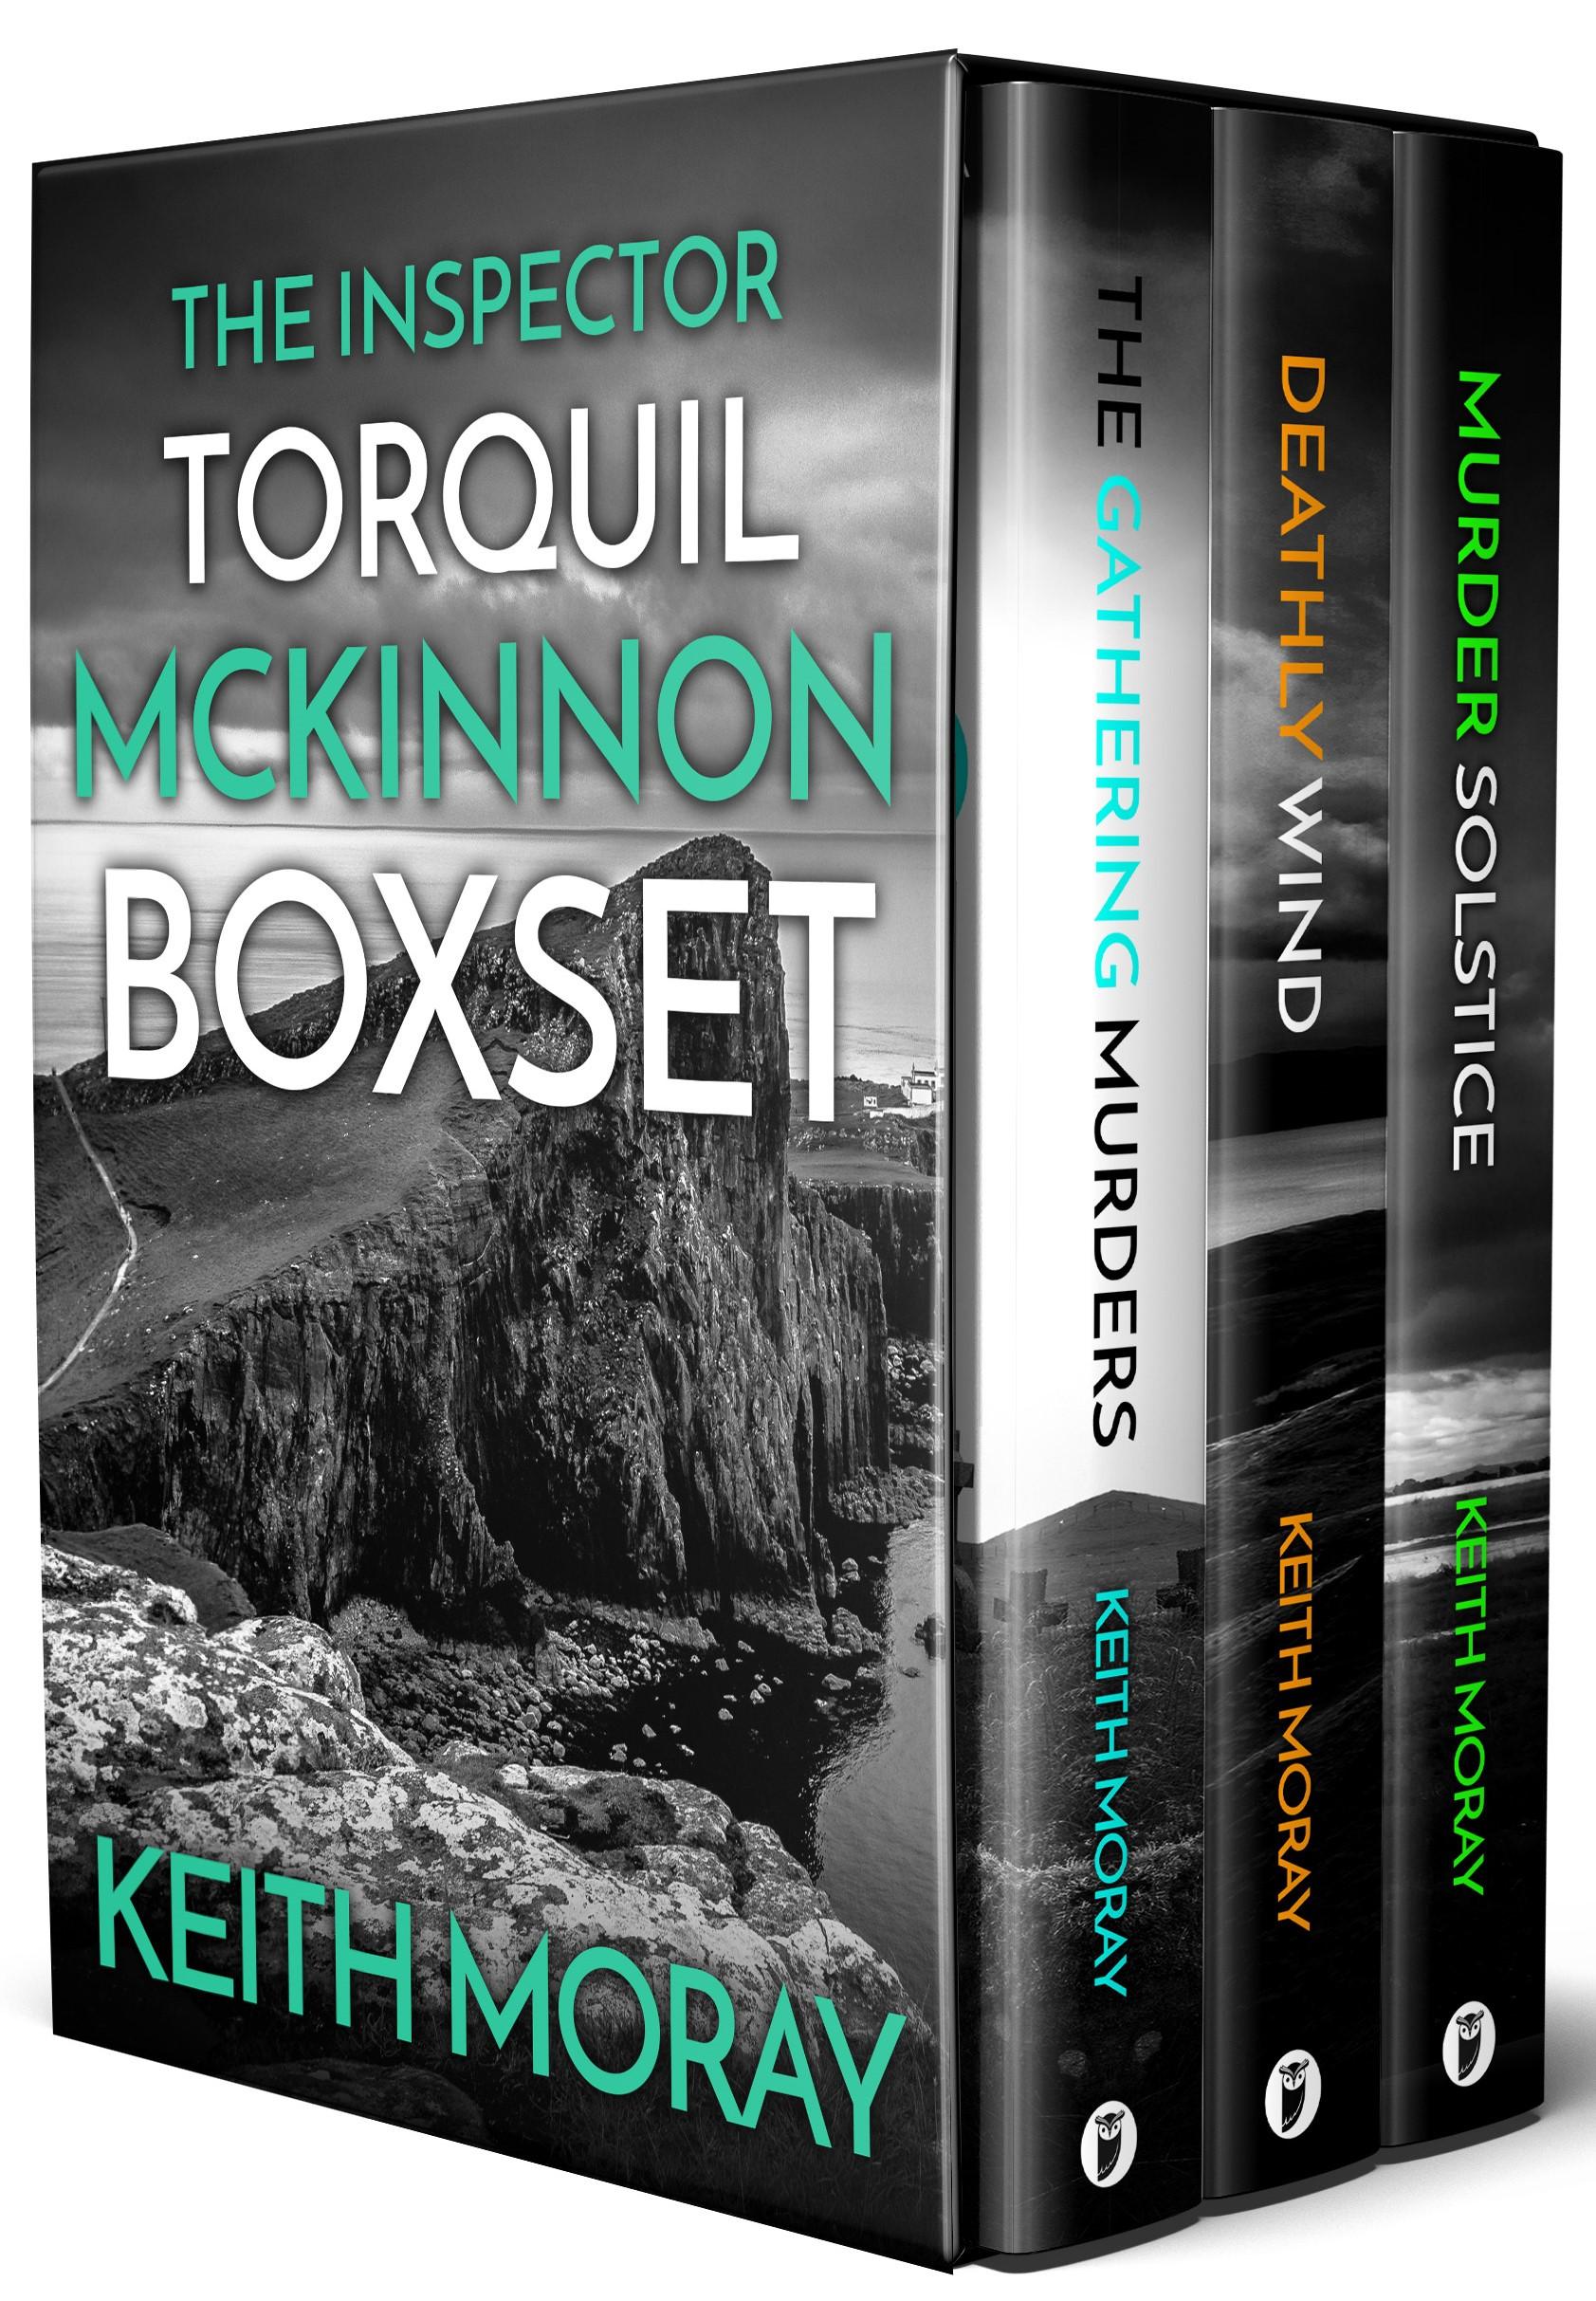 The Inspector Torquil McKinnon Boxset